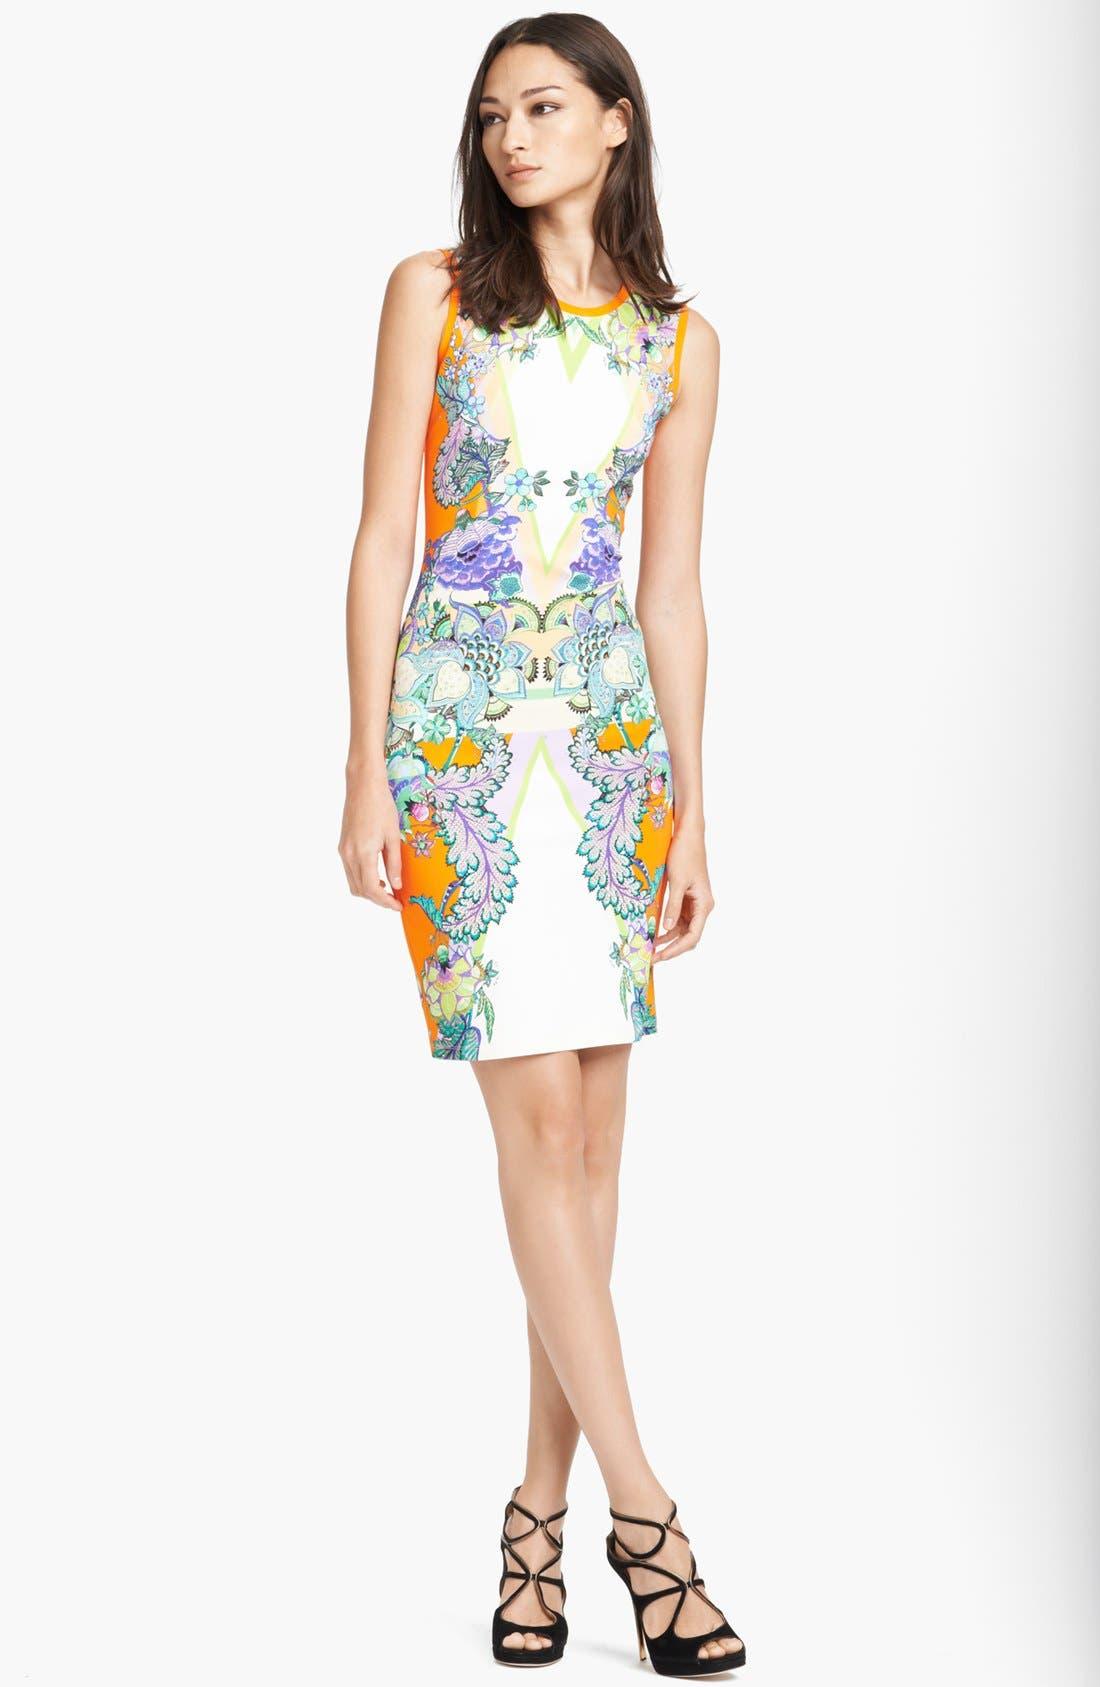 Main Image - Roberto Cavalli 'Padma Print' Punto Milano Dress